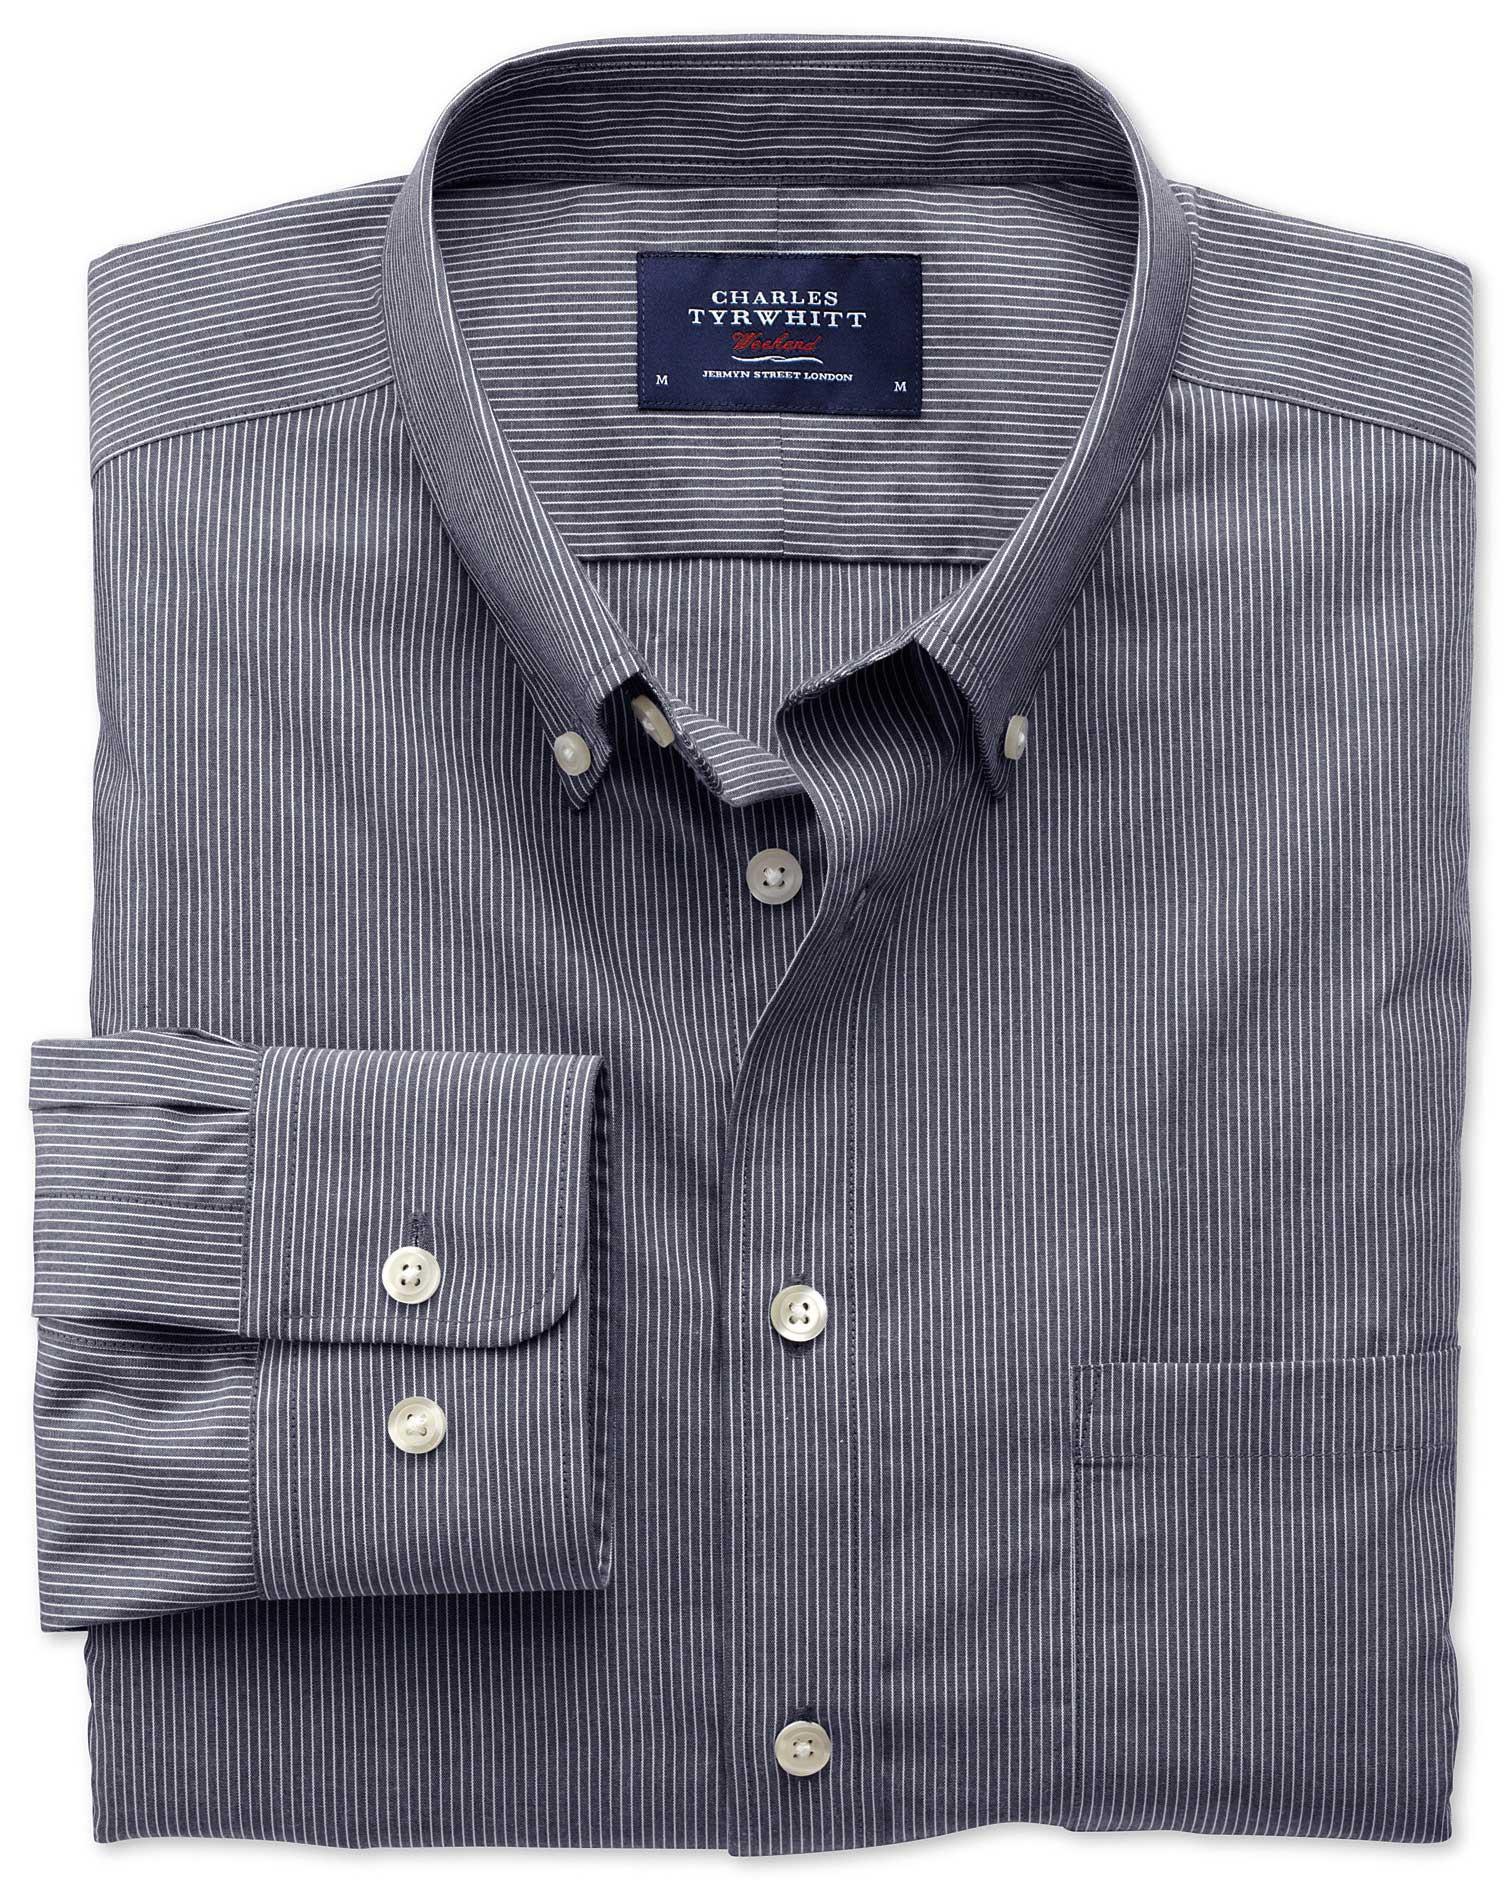 Extra Slim Fit Non-Iron Poplin Indigo Stripe Cotton Shirt Single Cuff Size XXL by Charles Tyrwhitt